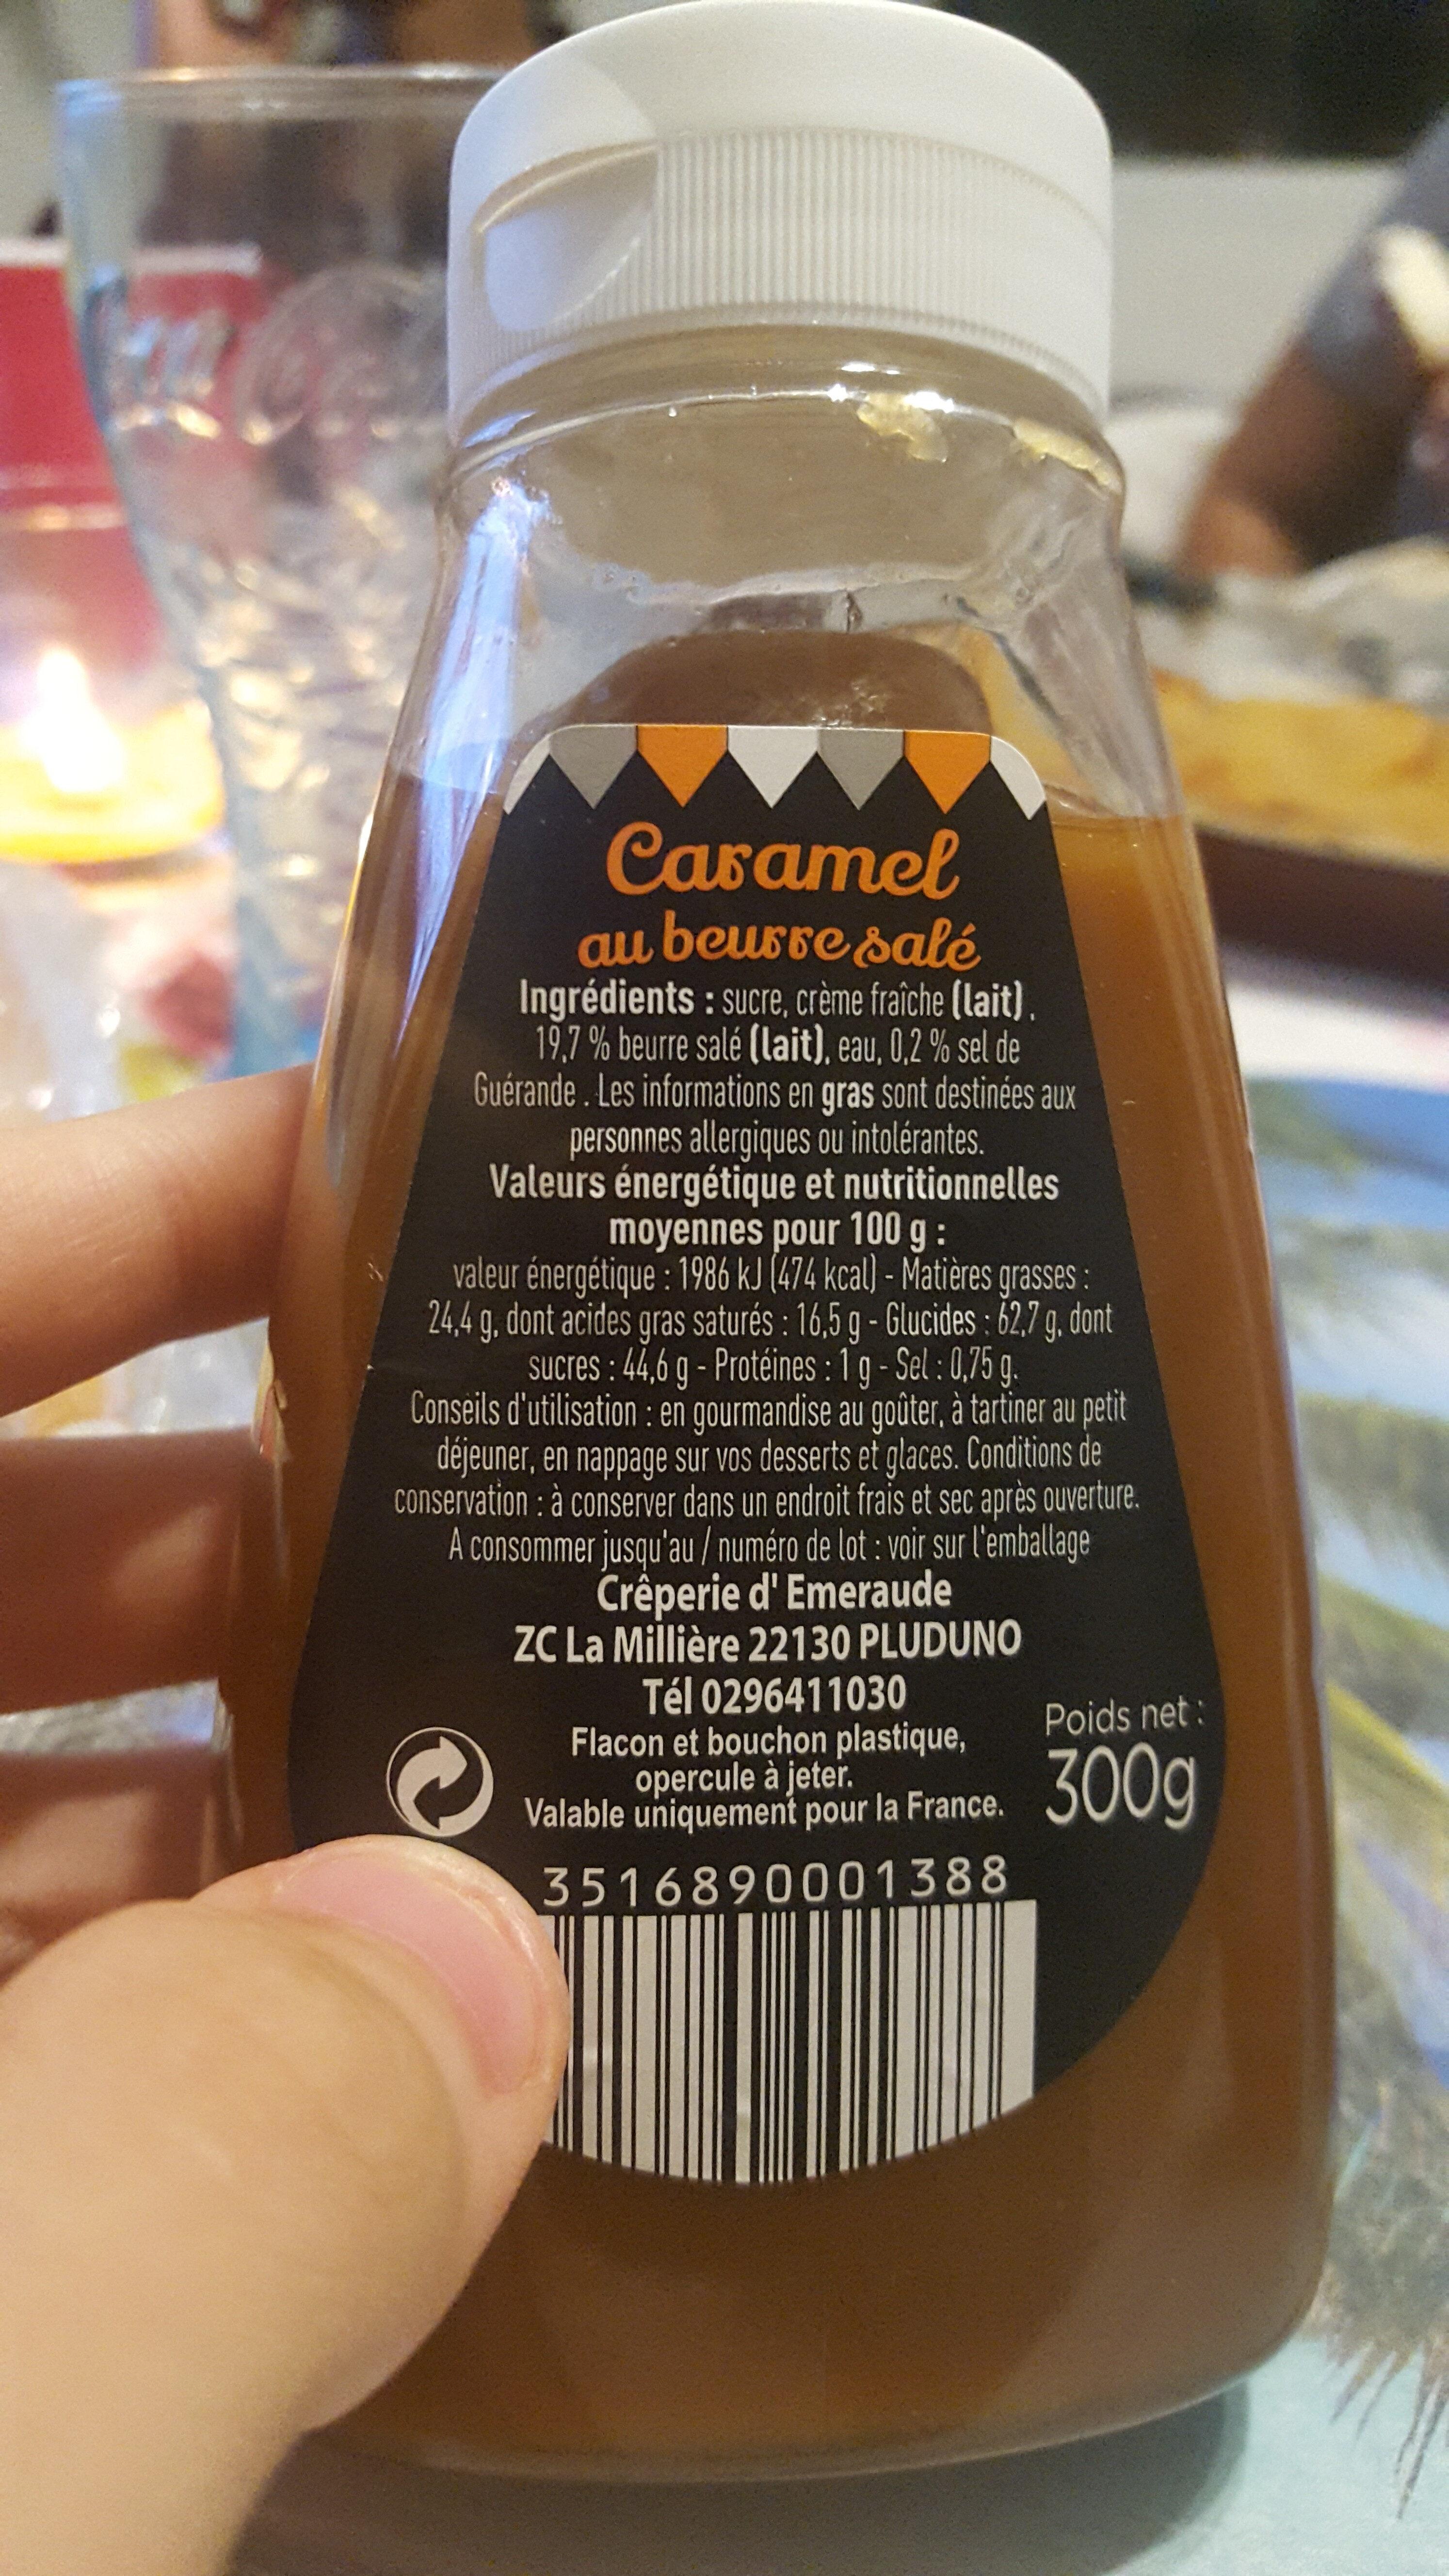 Caramel au beurre sale - Ingredients